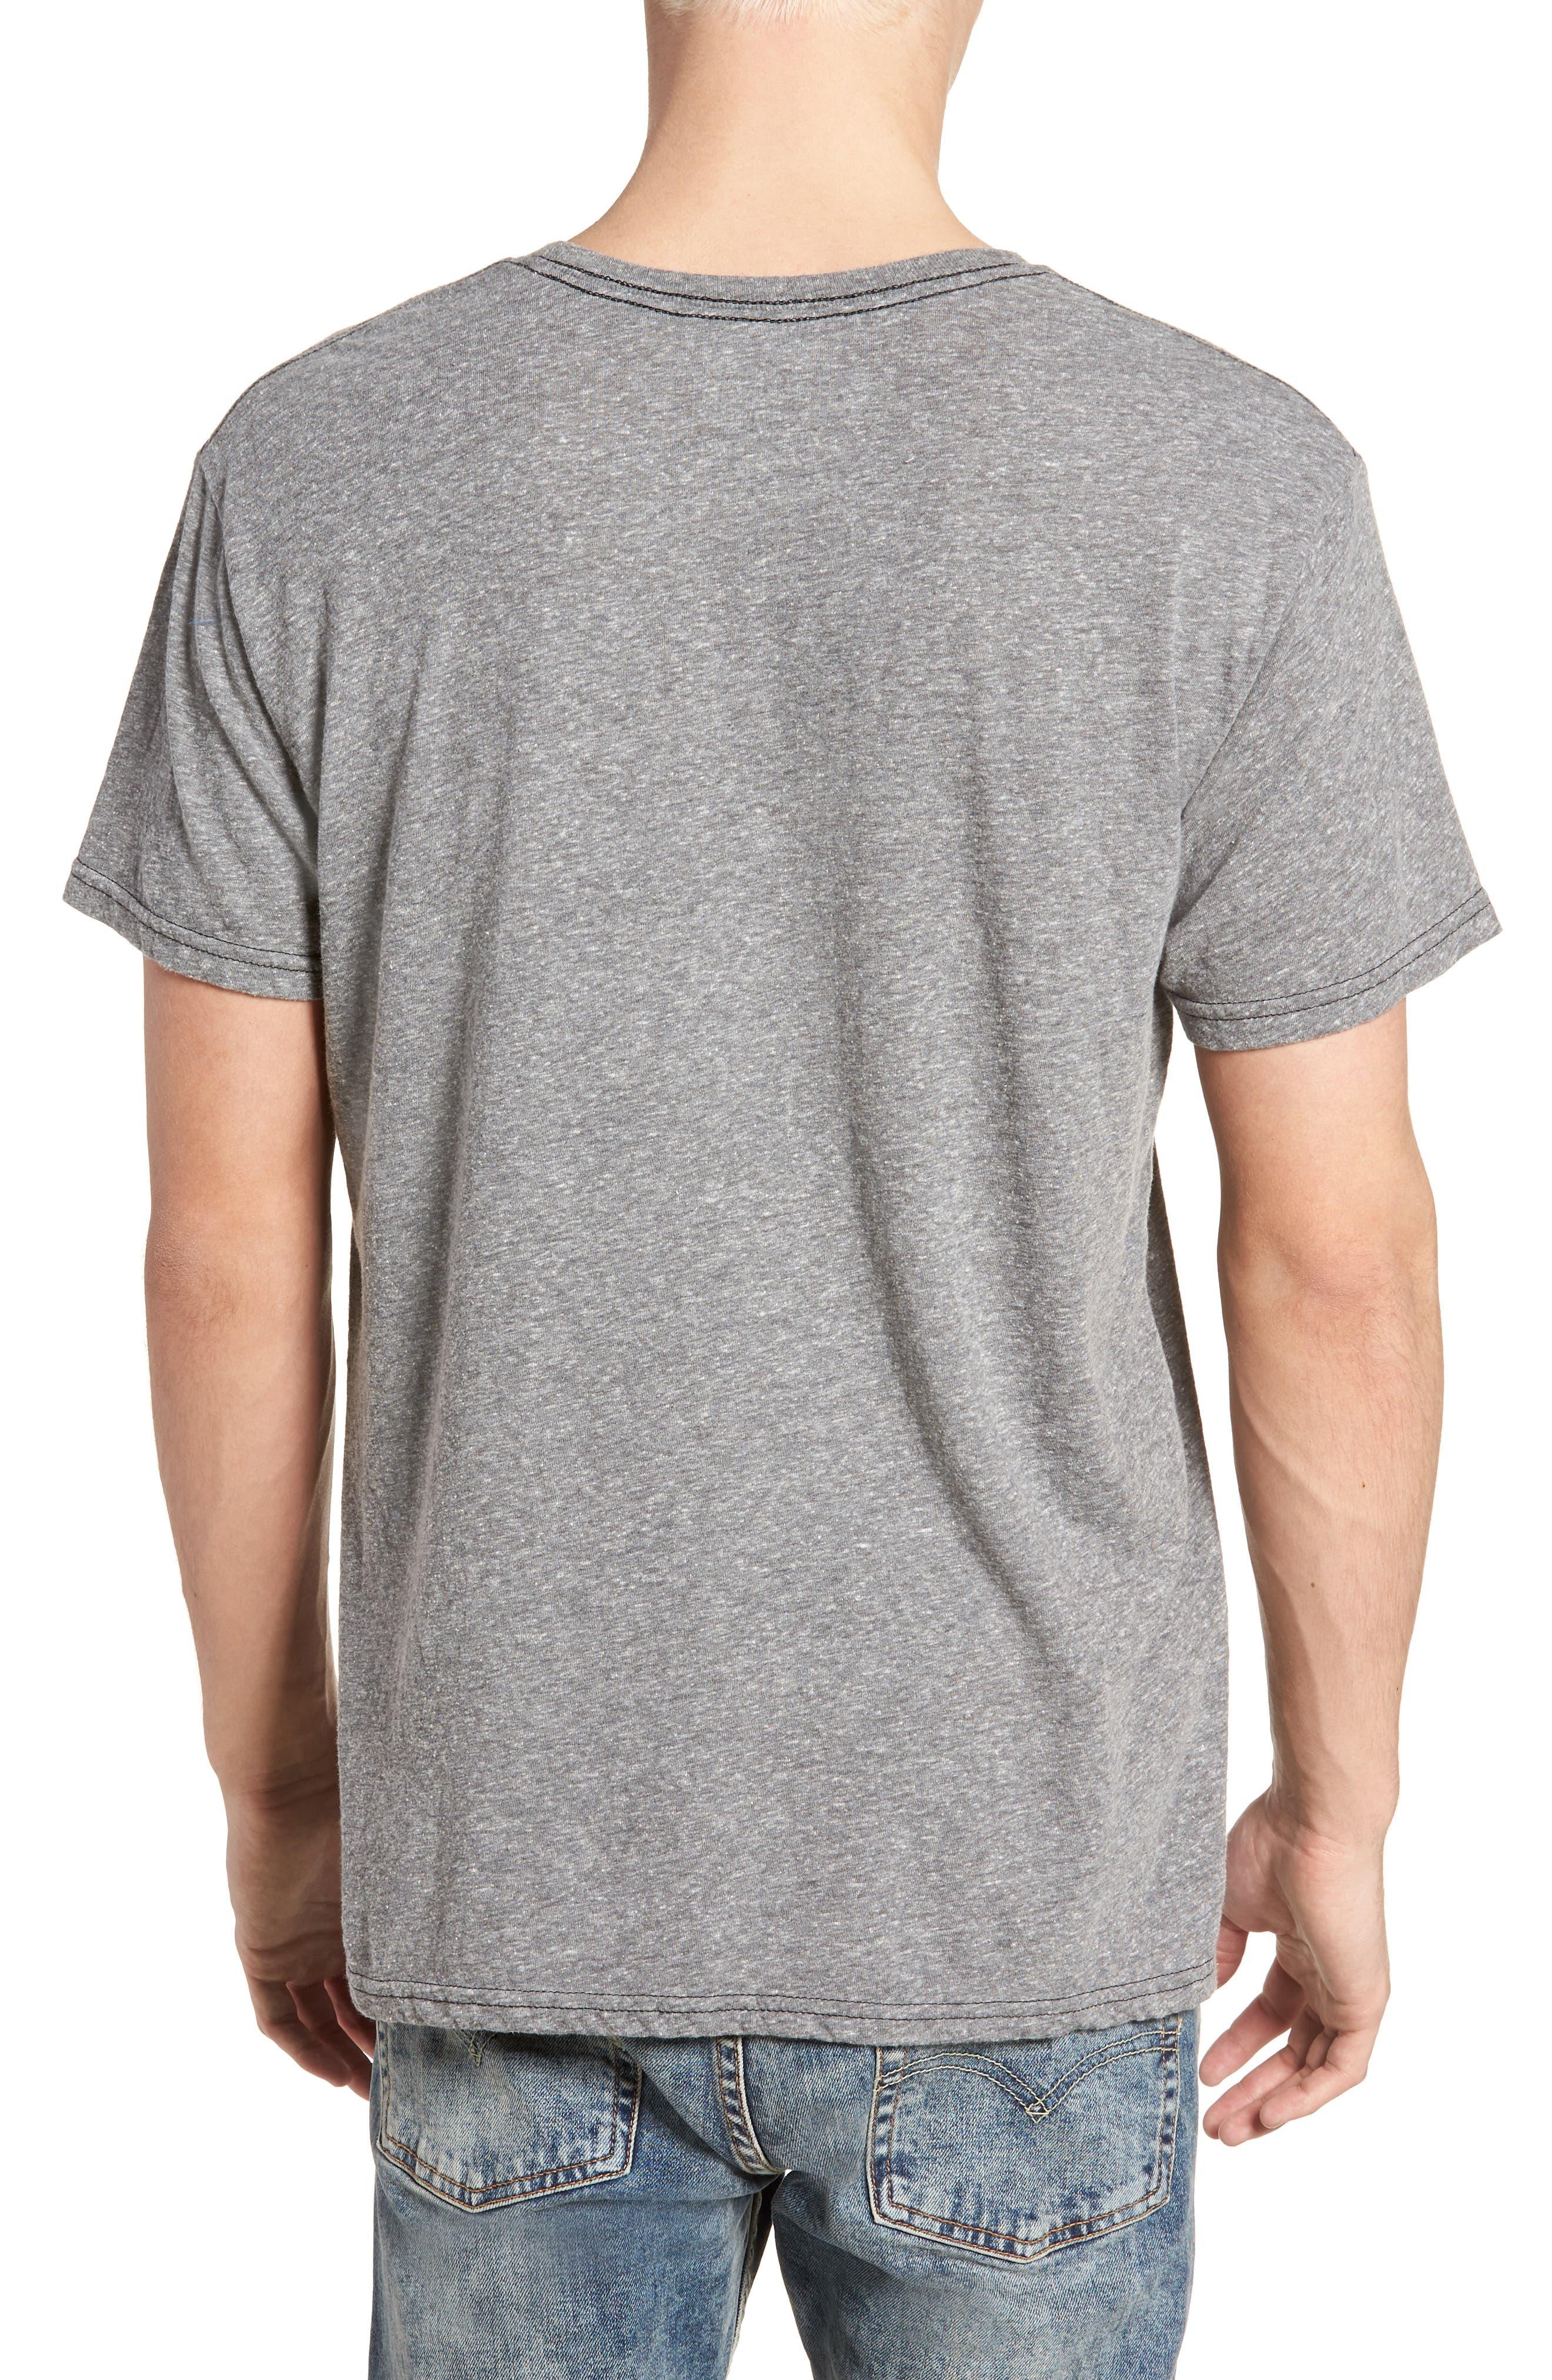 Alternate Image 2  - Retro Brand ESPN Graphic T-Shirt